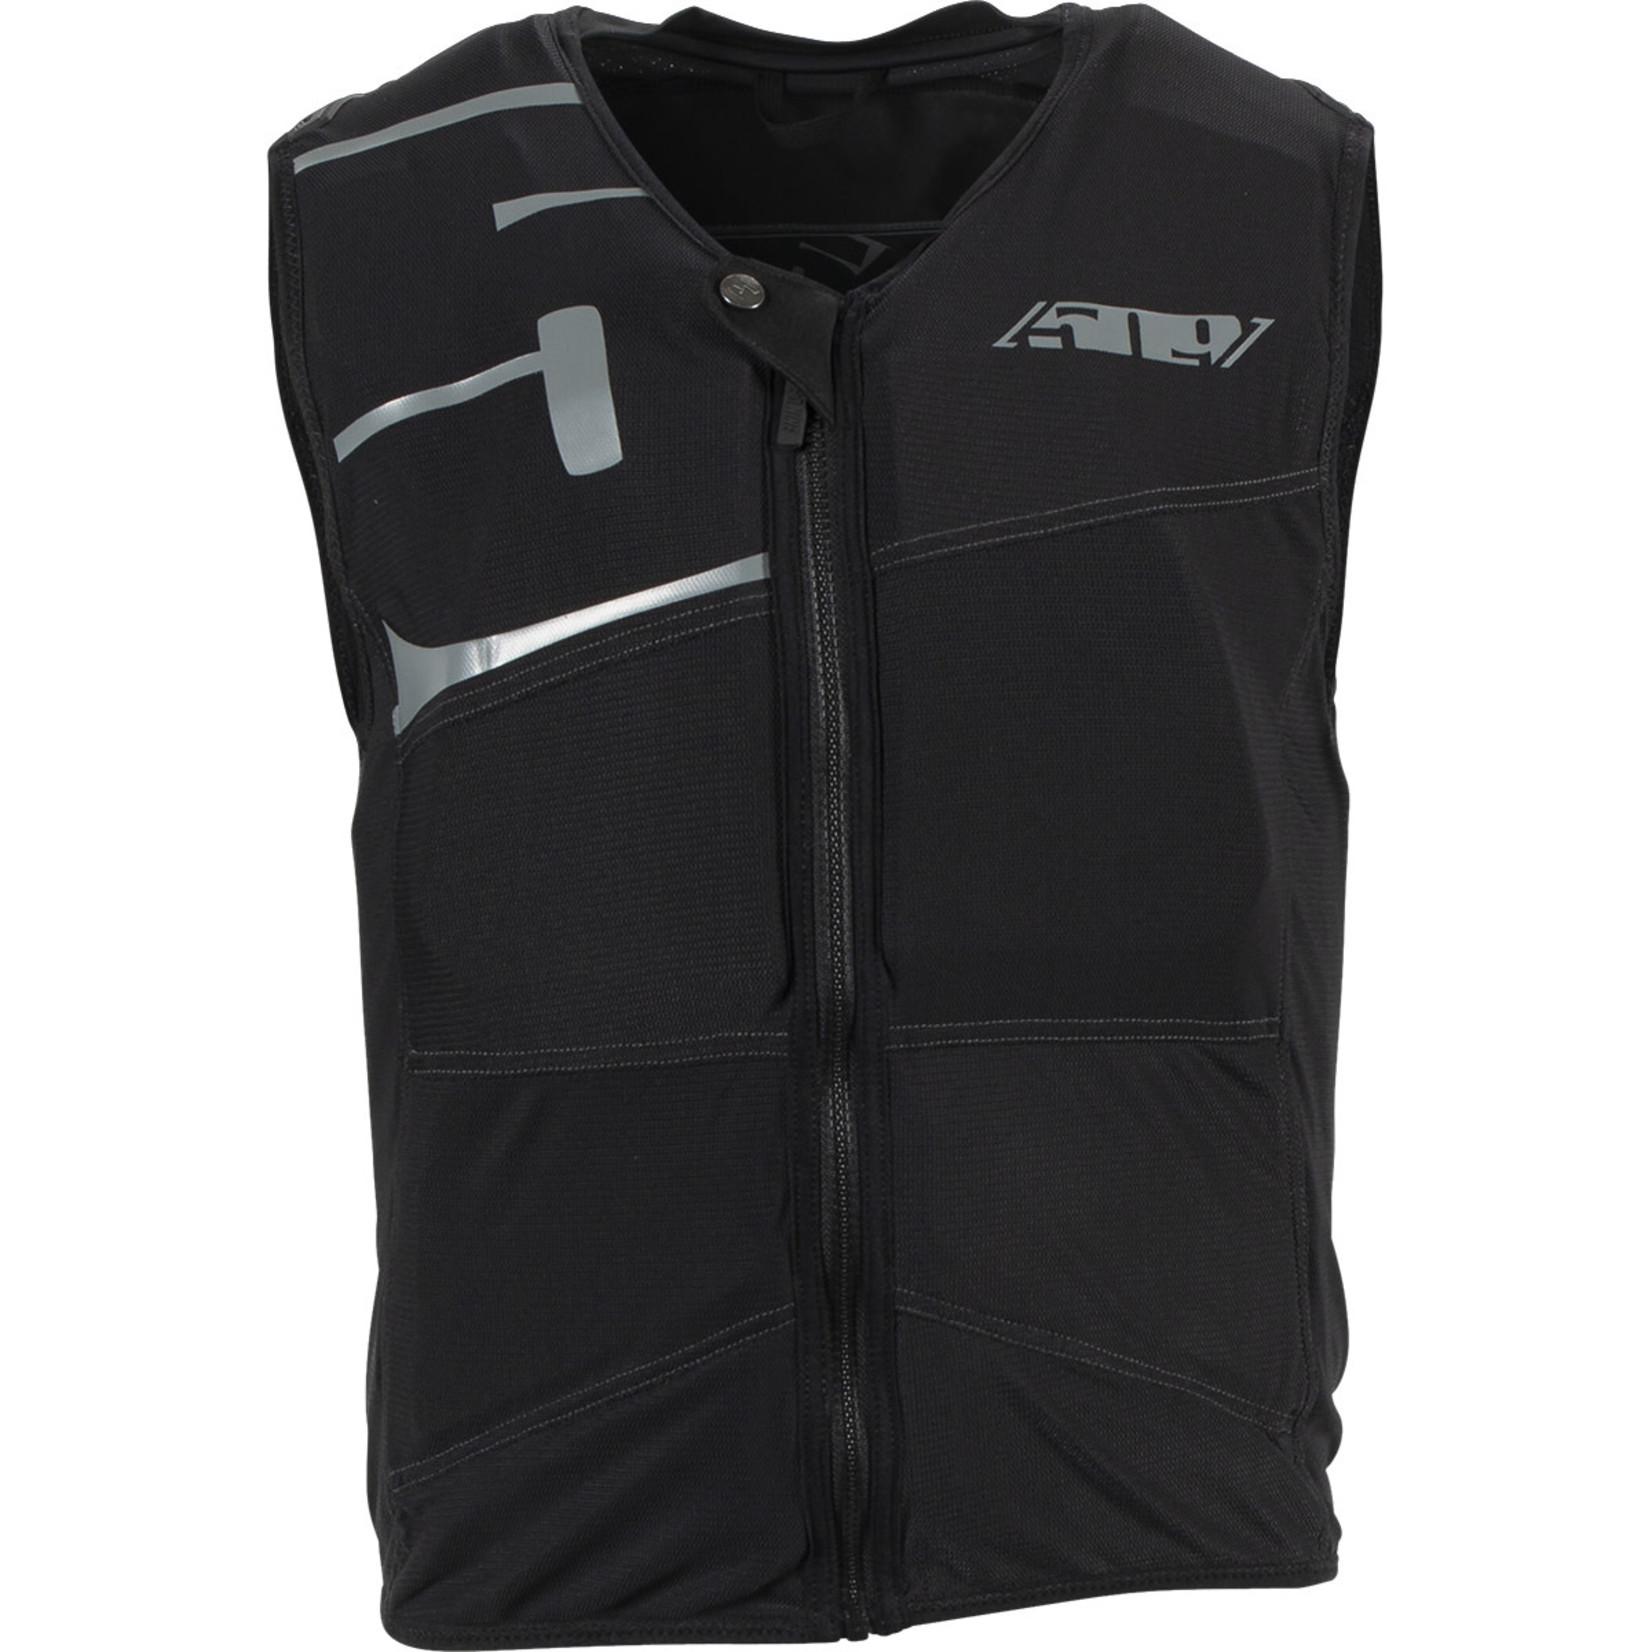 509 R-More Protection Vest